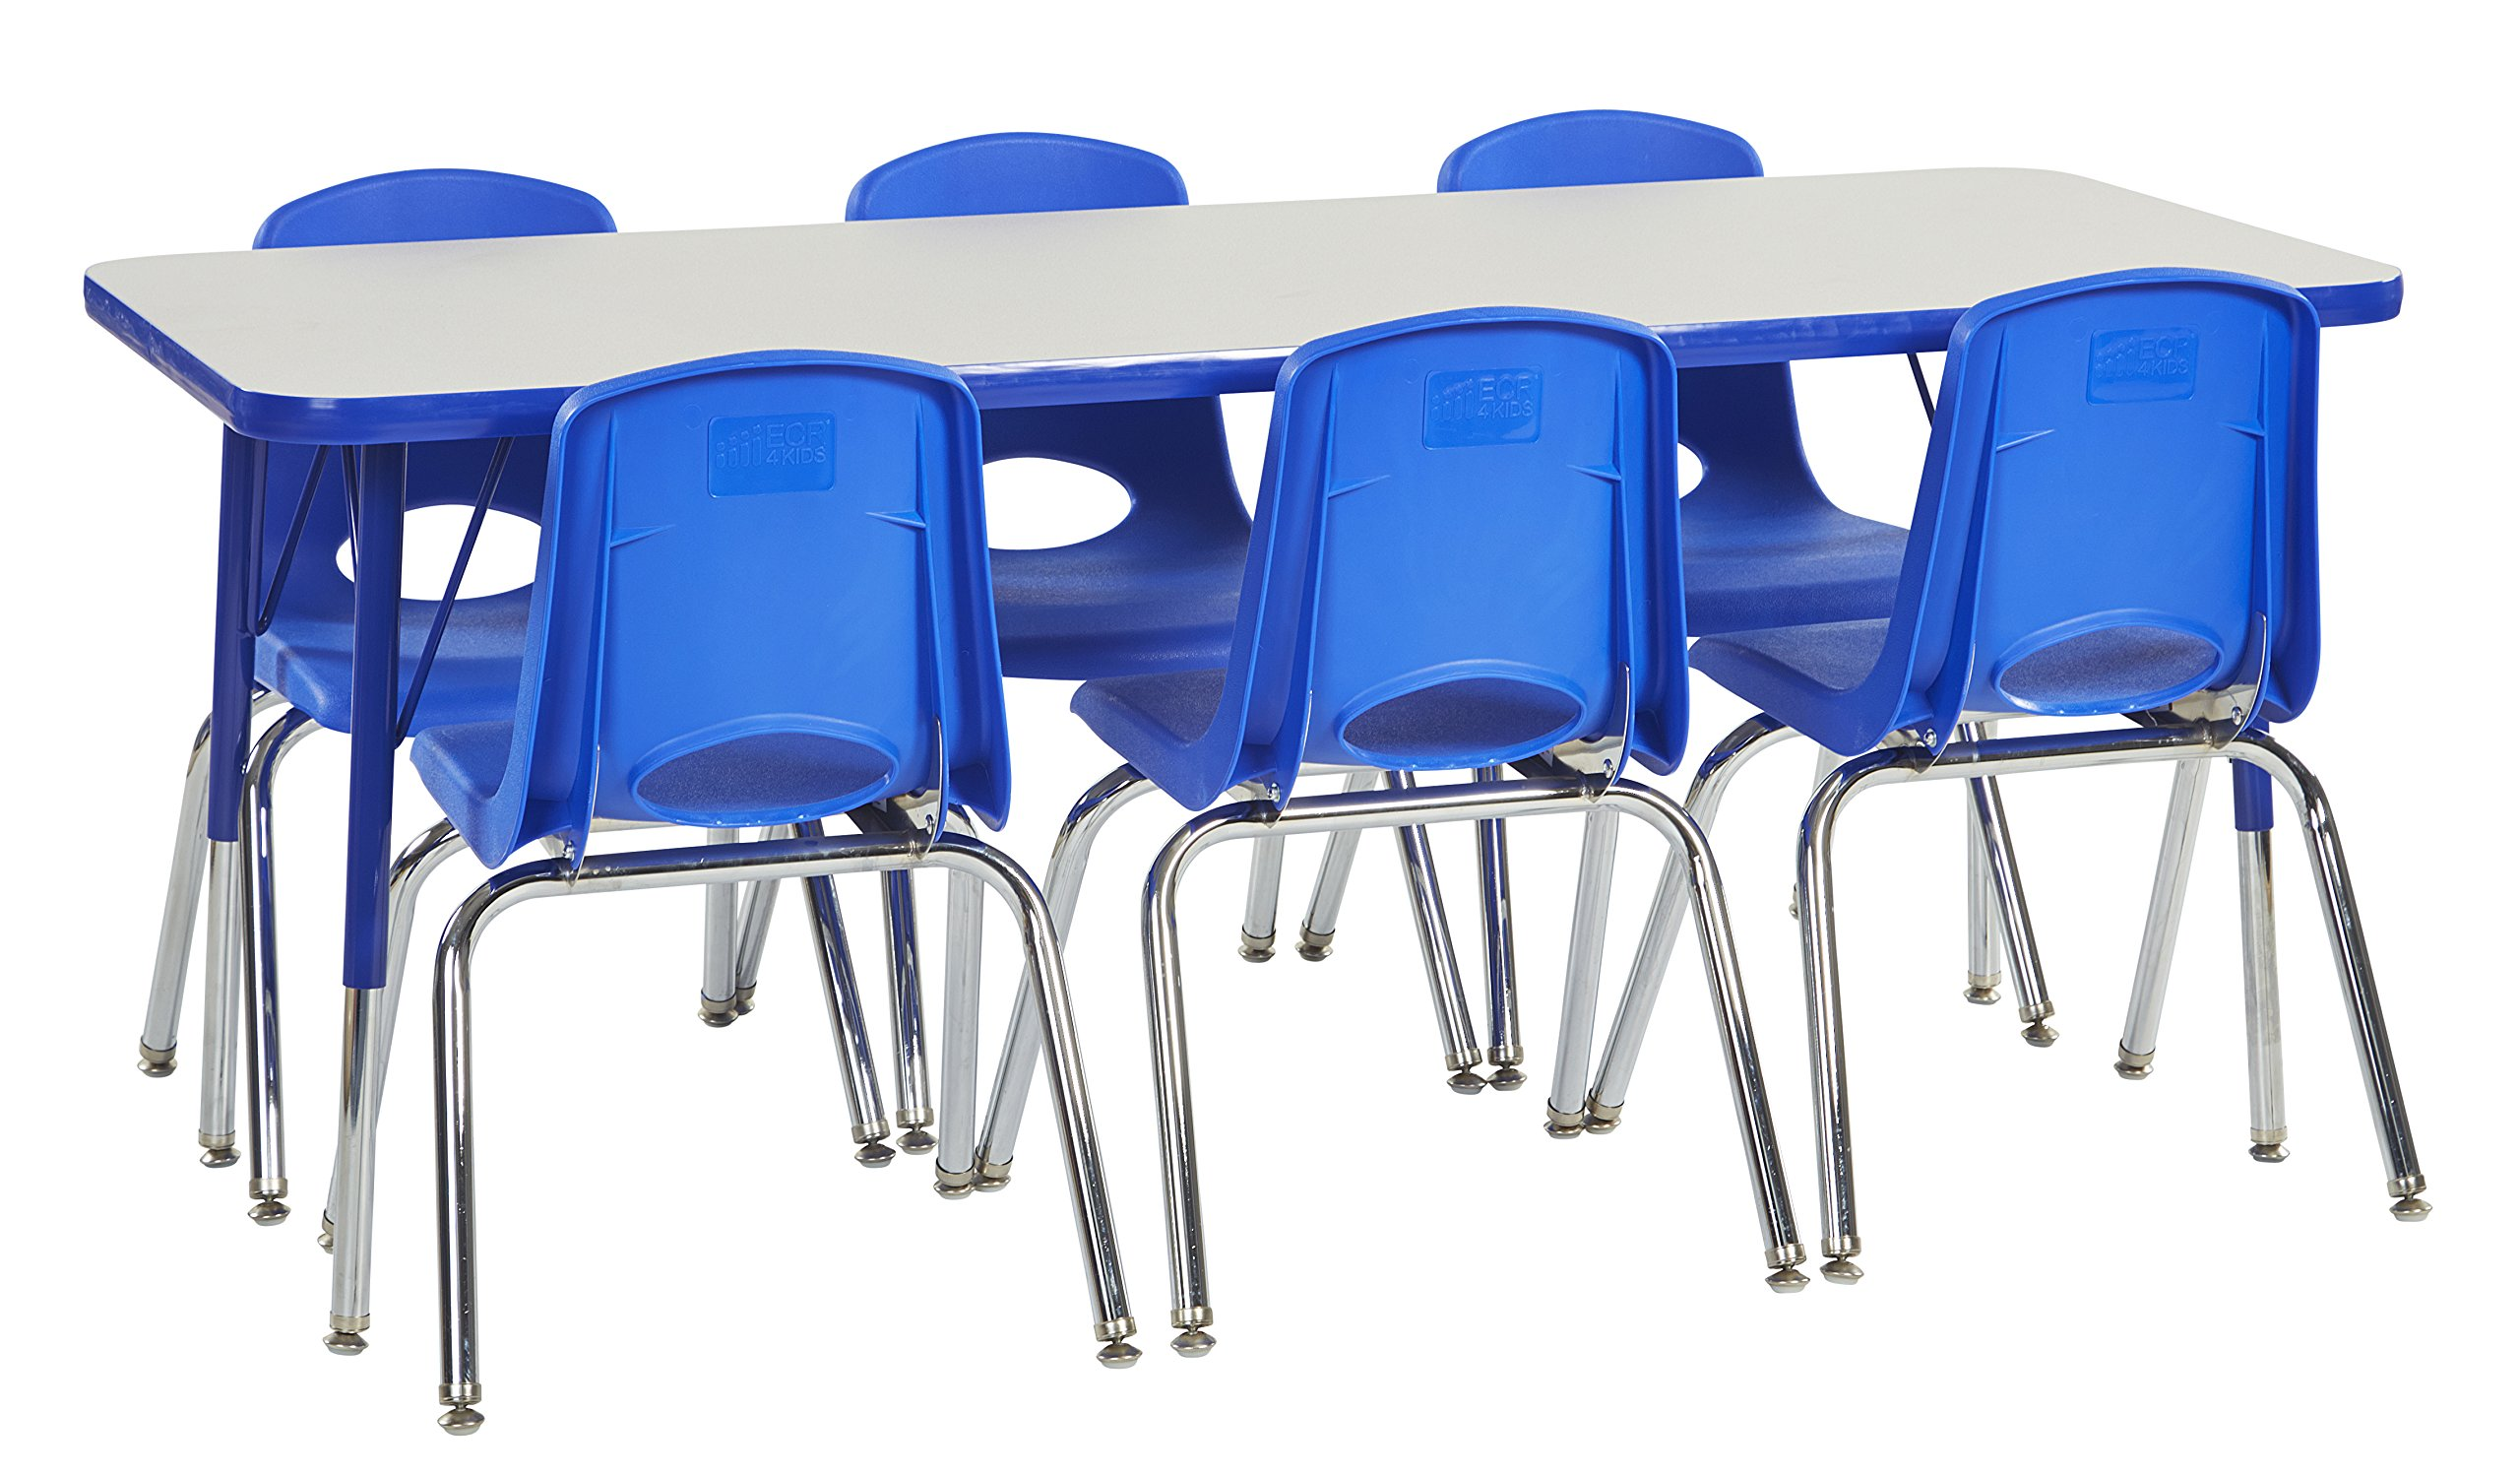 ECR4Kids 24'' x 60'' Rectangular Activity Table, Gray Top/Blue Edge, Toddler Legs/Swivel Glides, Six 10'' Blue School Stack Chairs